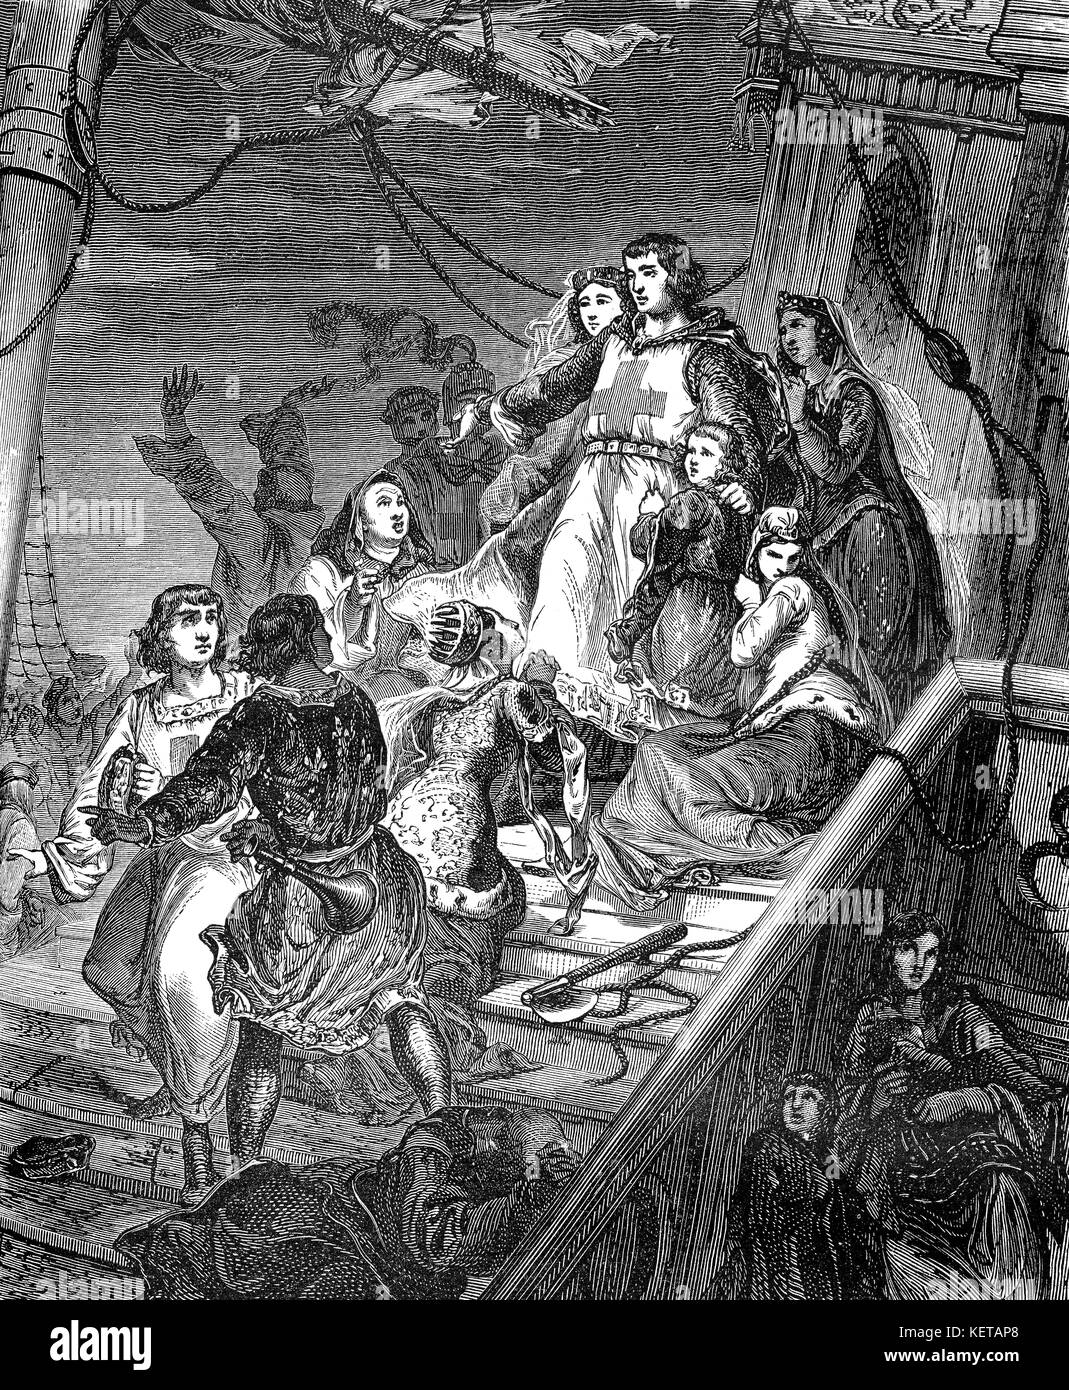 La salida de Aigues-Mortes del rey Luis IX para la Séptima Cruzada Foto de stock